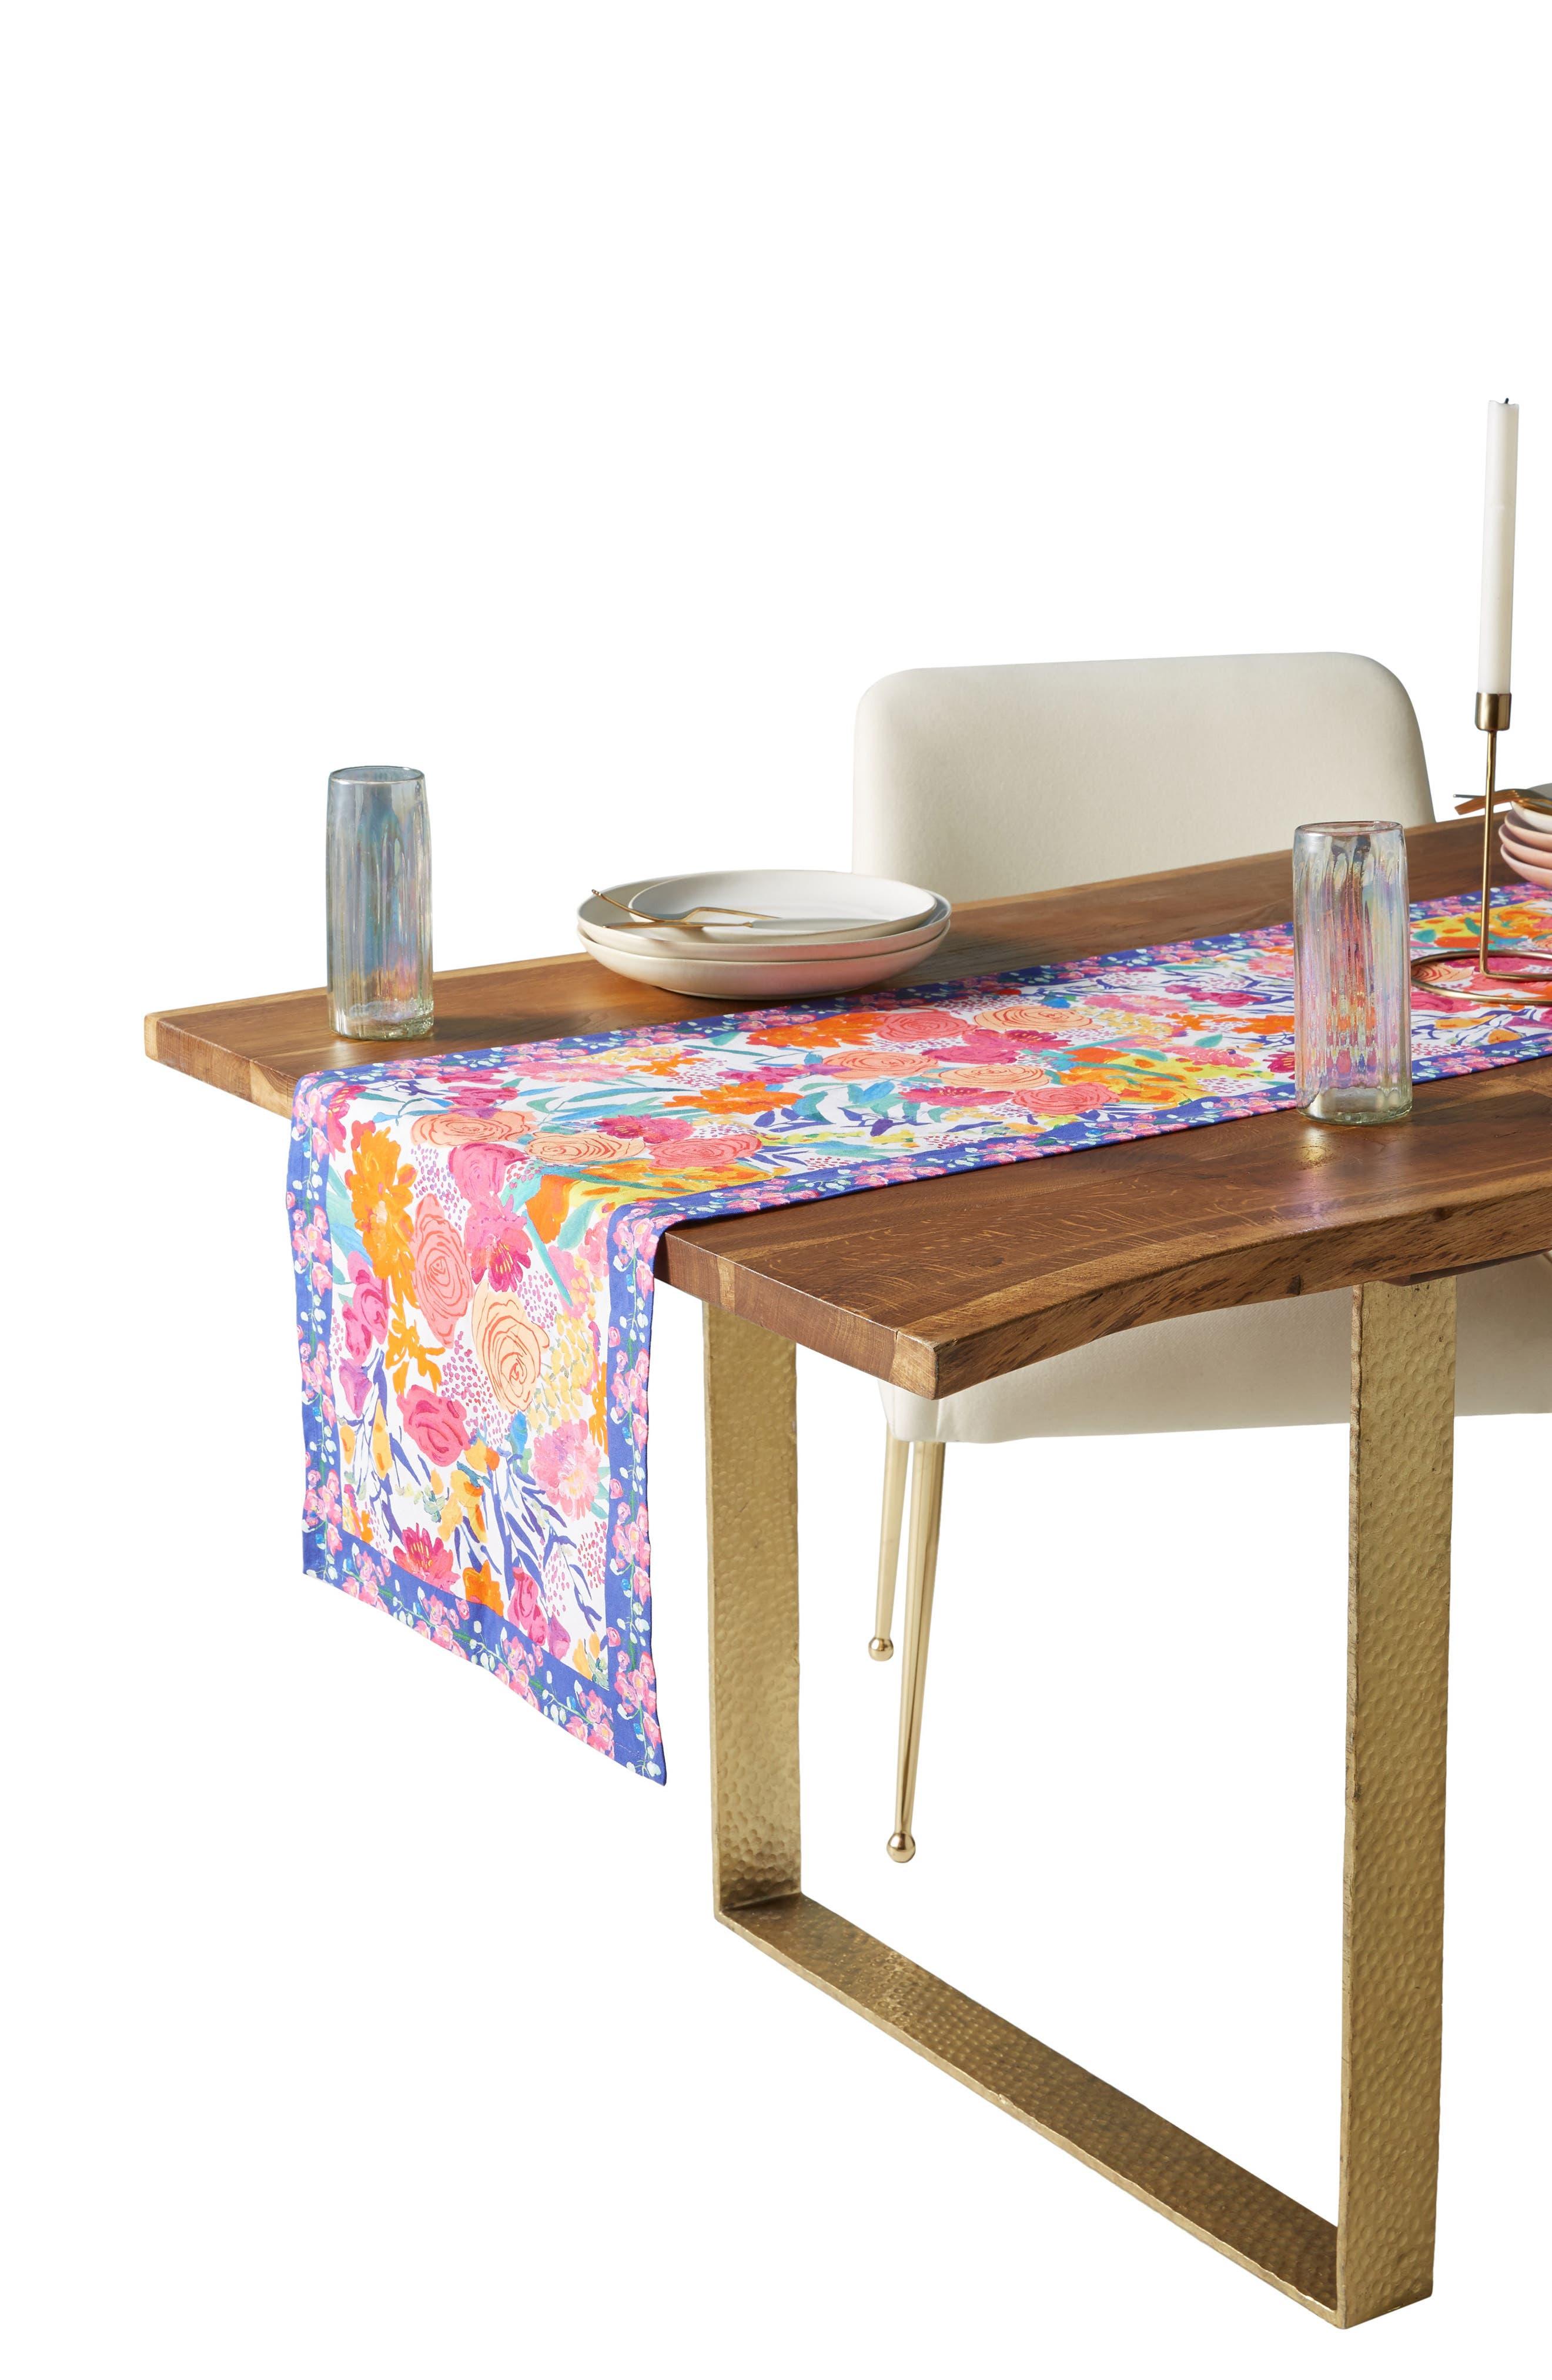 Paint + Petals Table Runner,                             Alternate thumbnail 3, color,                             100